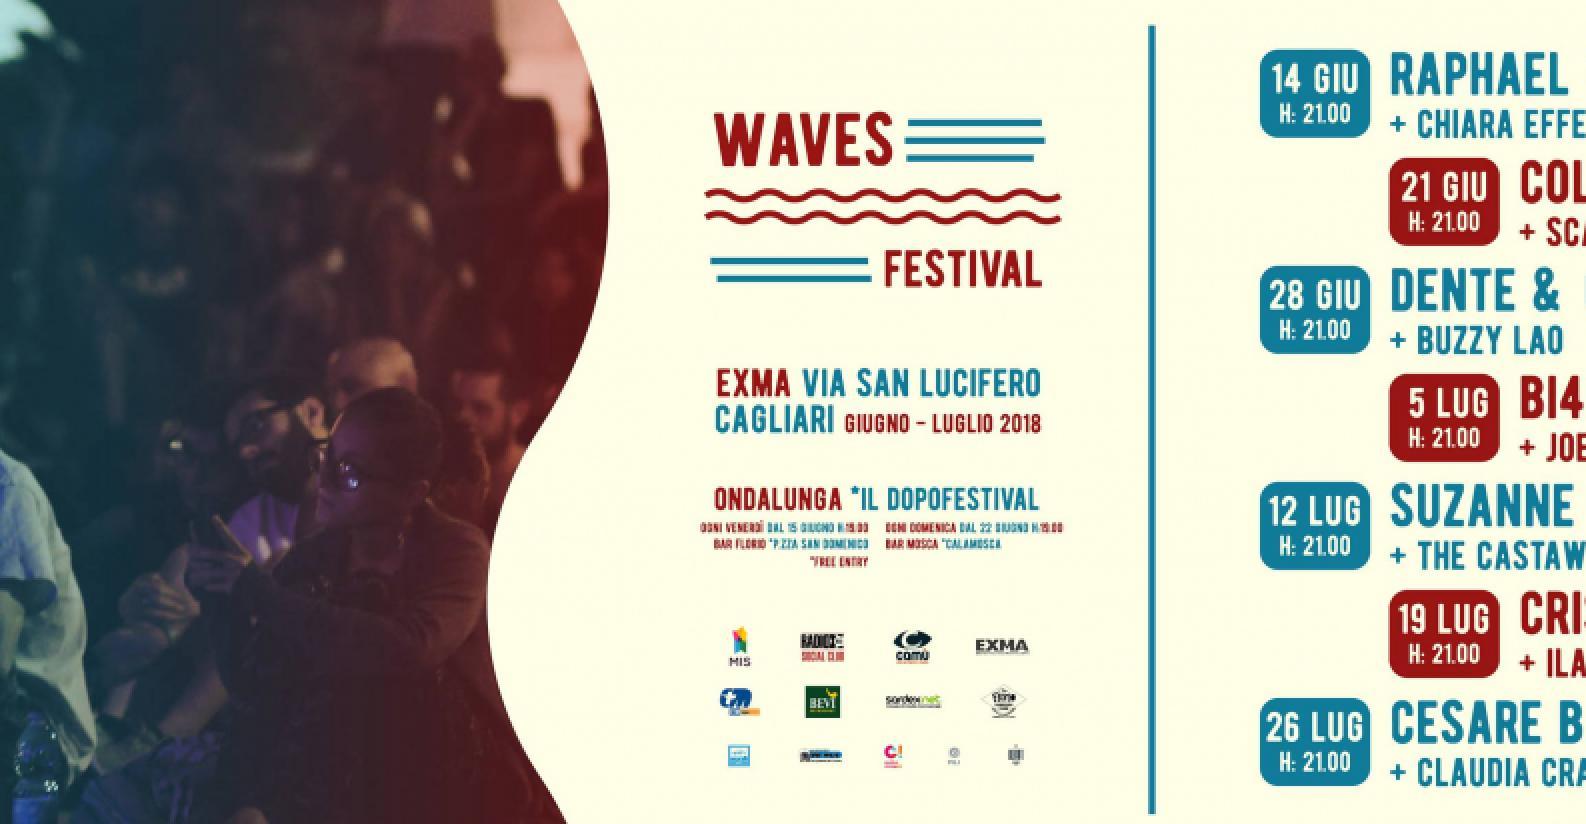 Waves Festival (locandina)